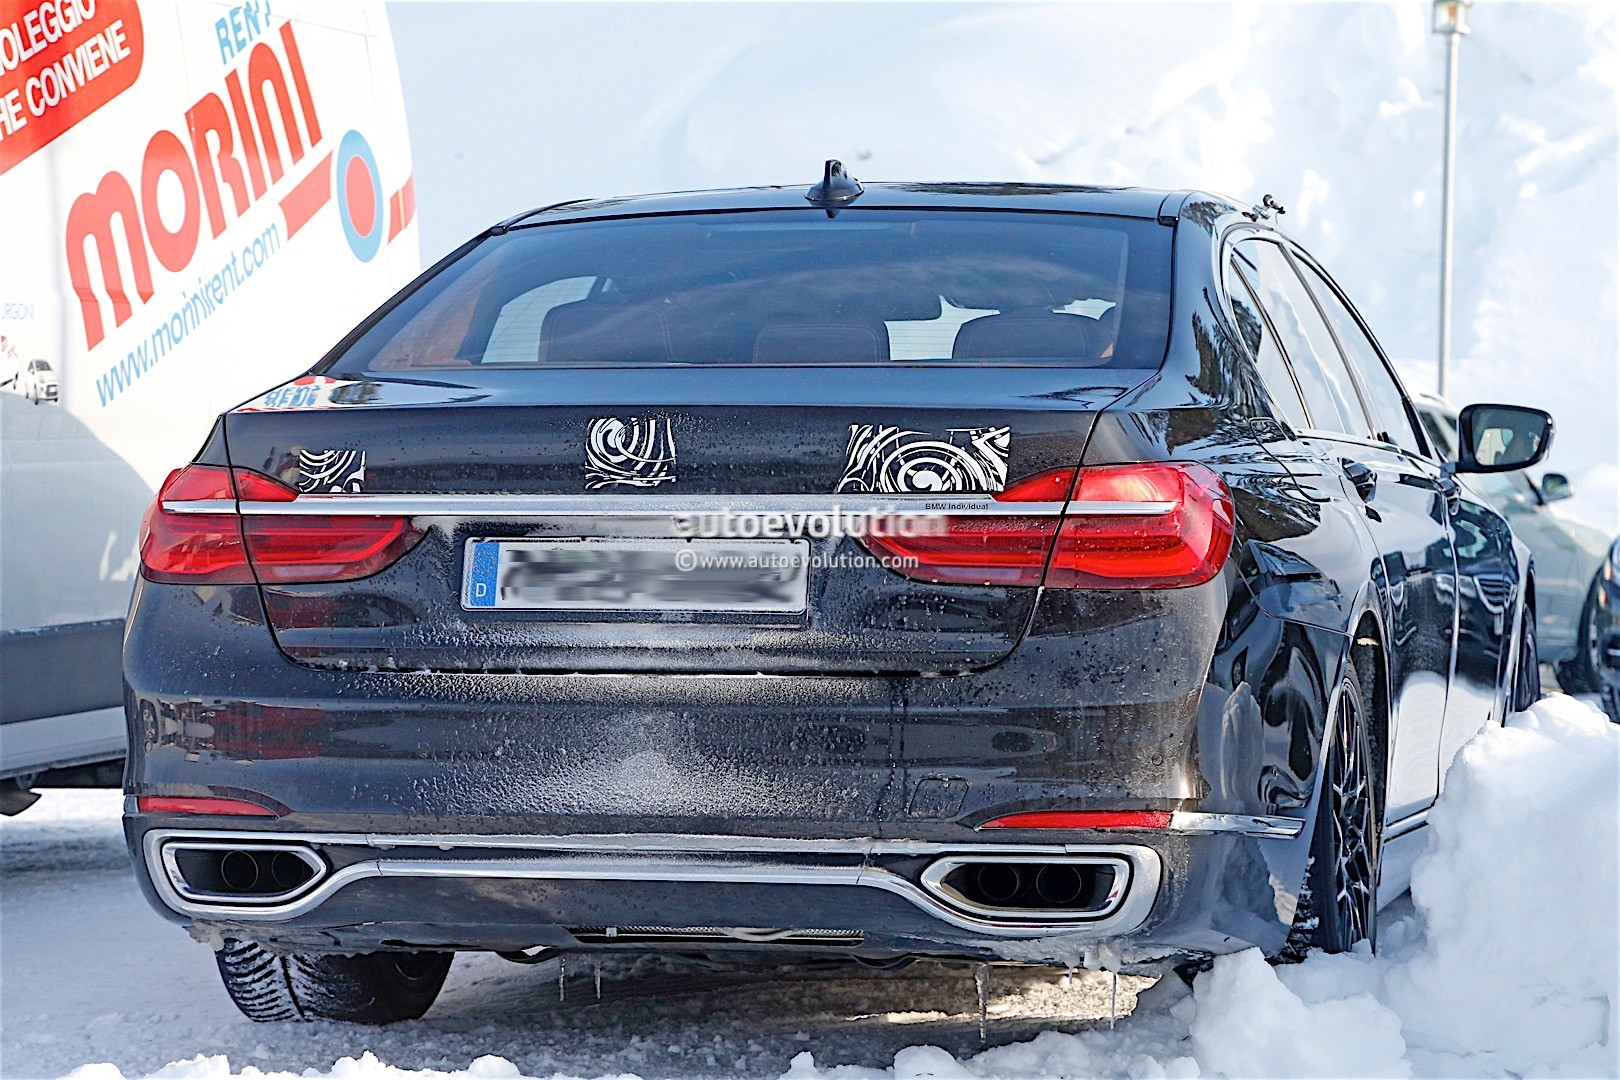 2018 BMW M7 Prototype Revealed in Latest Spyshots ...